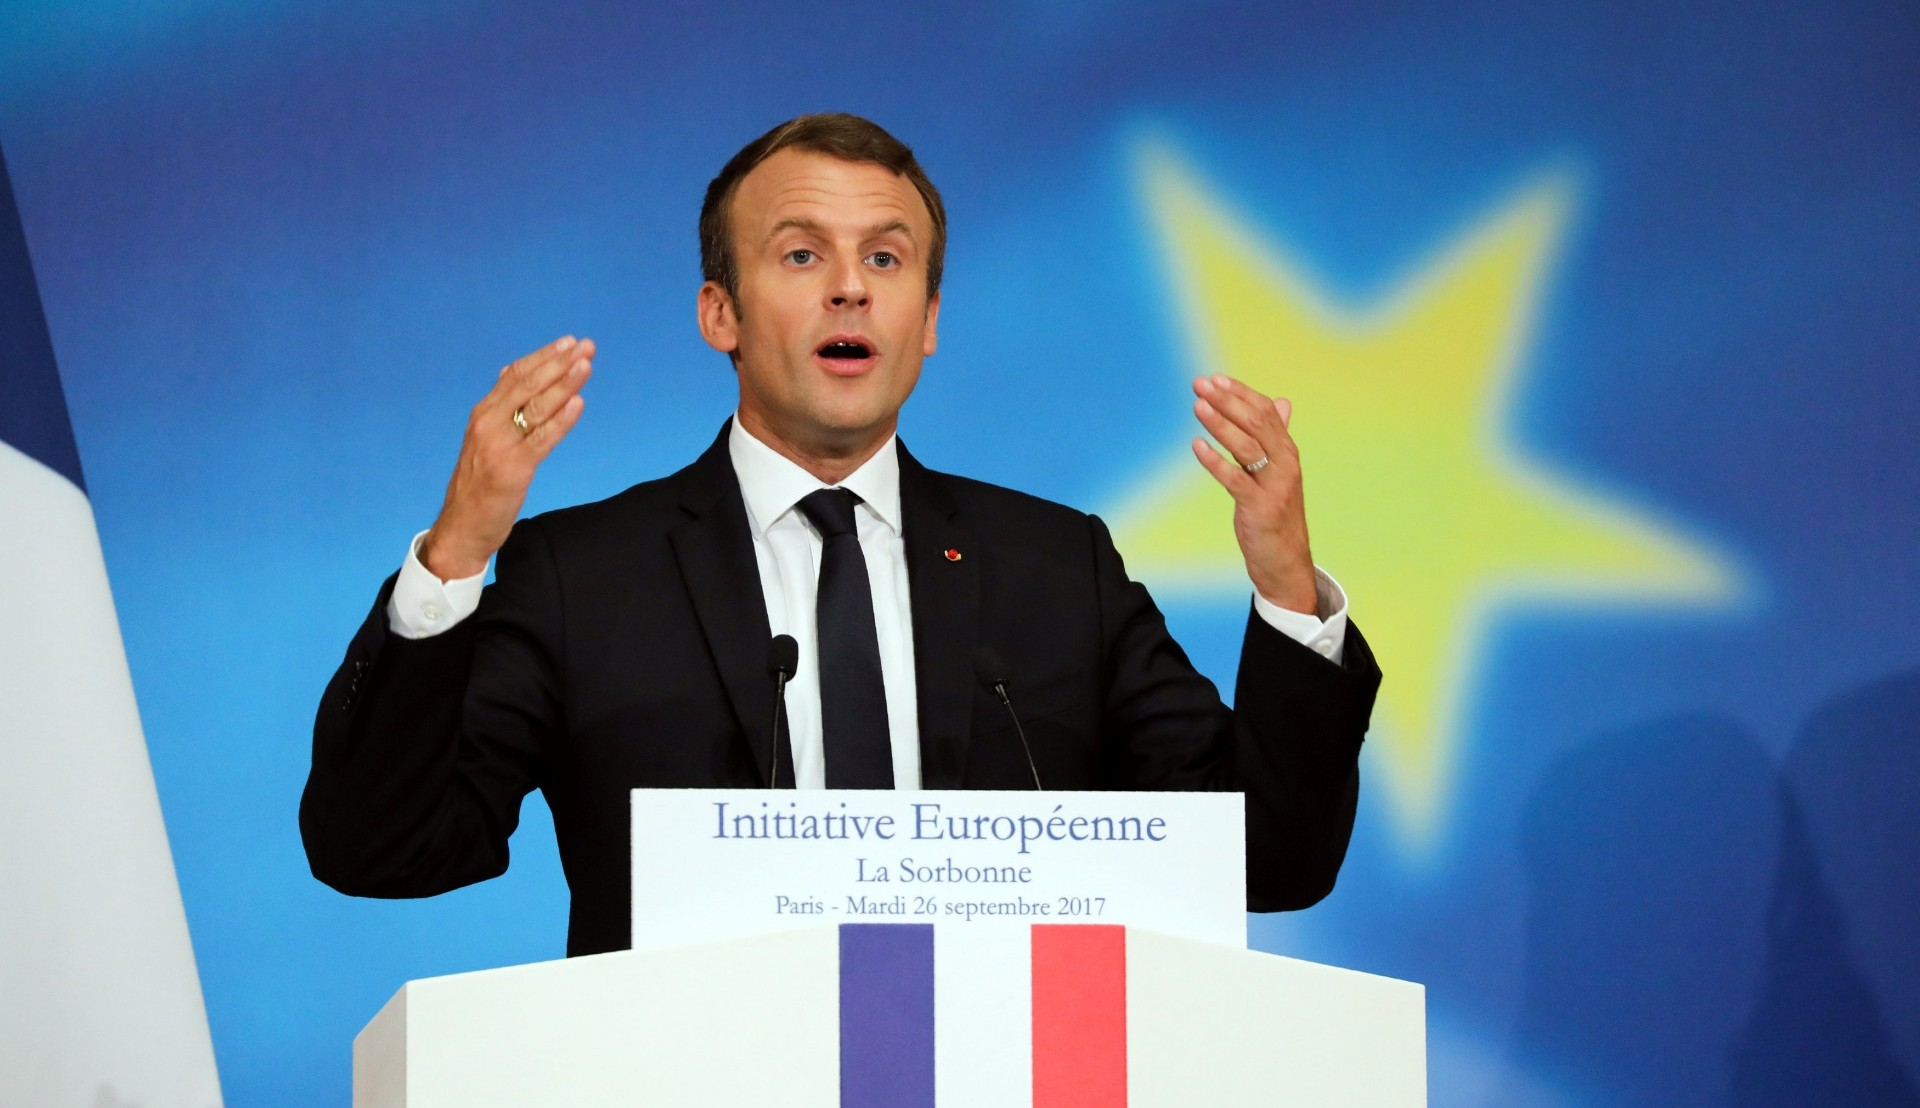 El presidente francés Emmanuel Macron (REUTERS/Ludovic Marin/Pool)